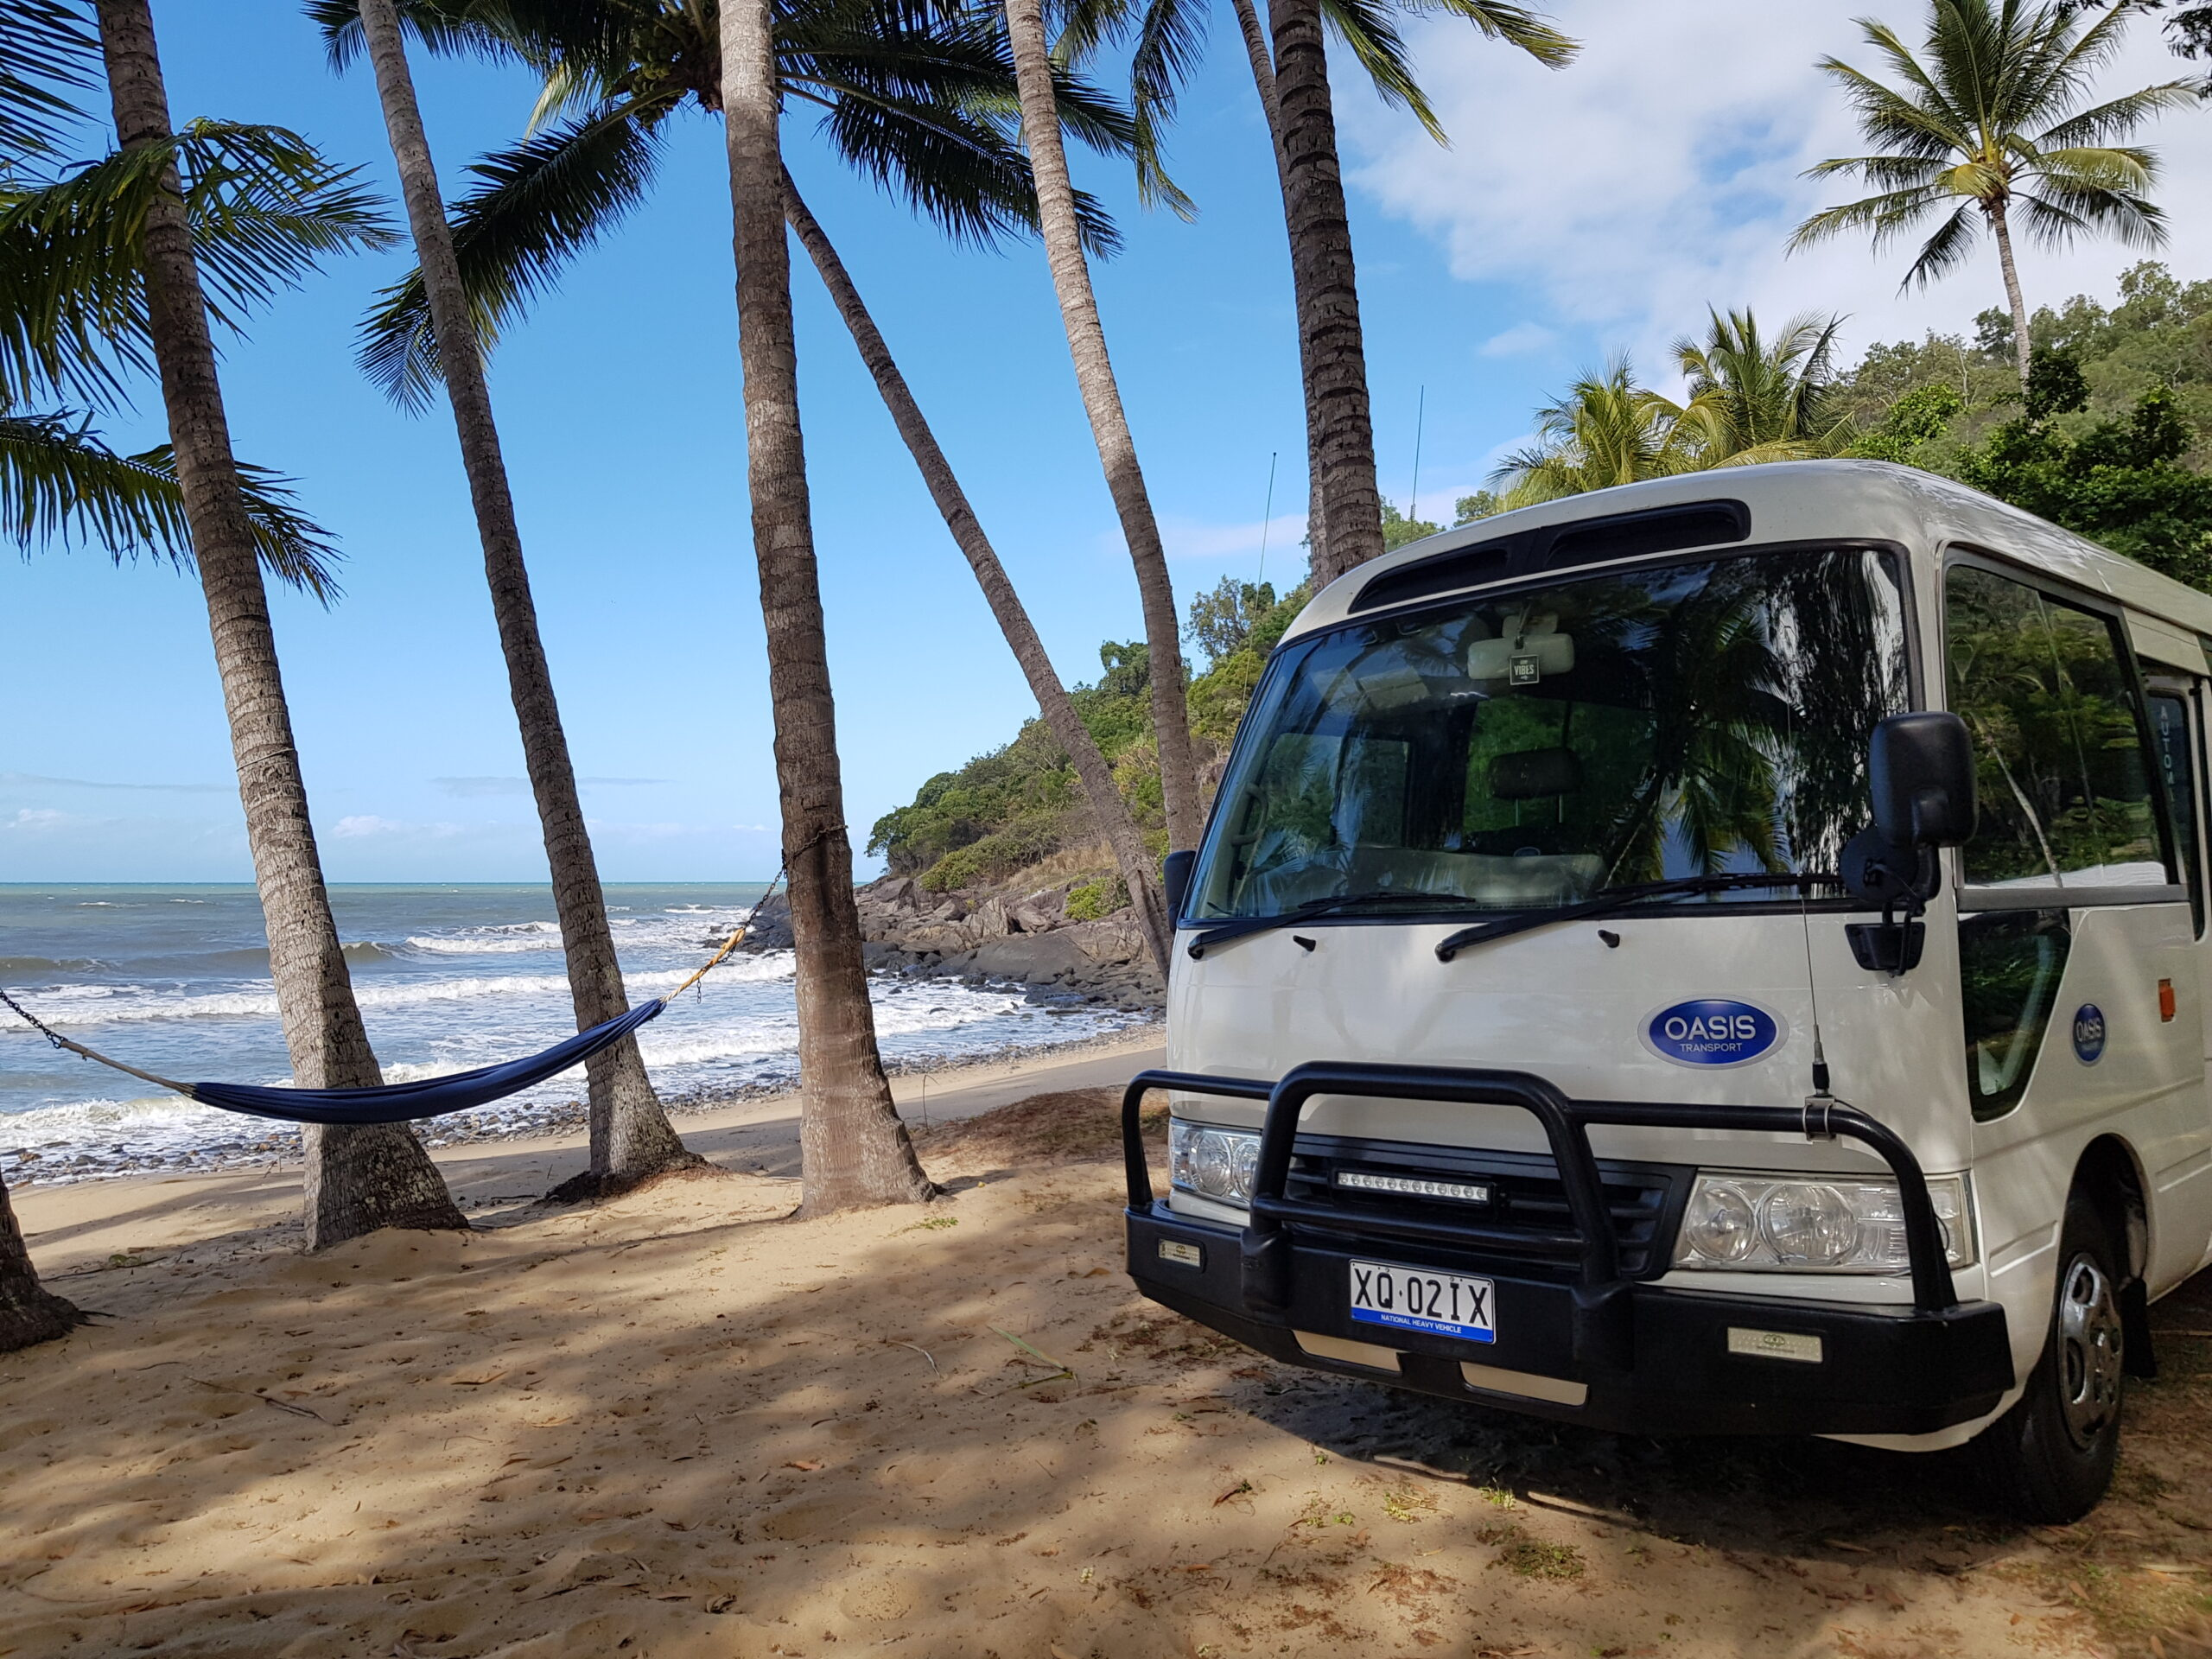 Shuttle – Machans Beach to Port Douglas